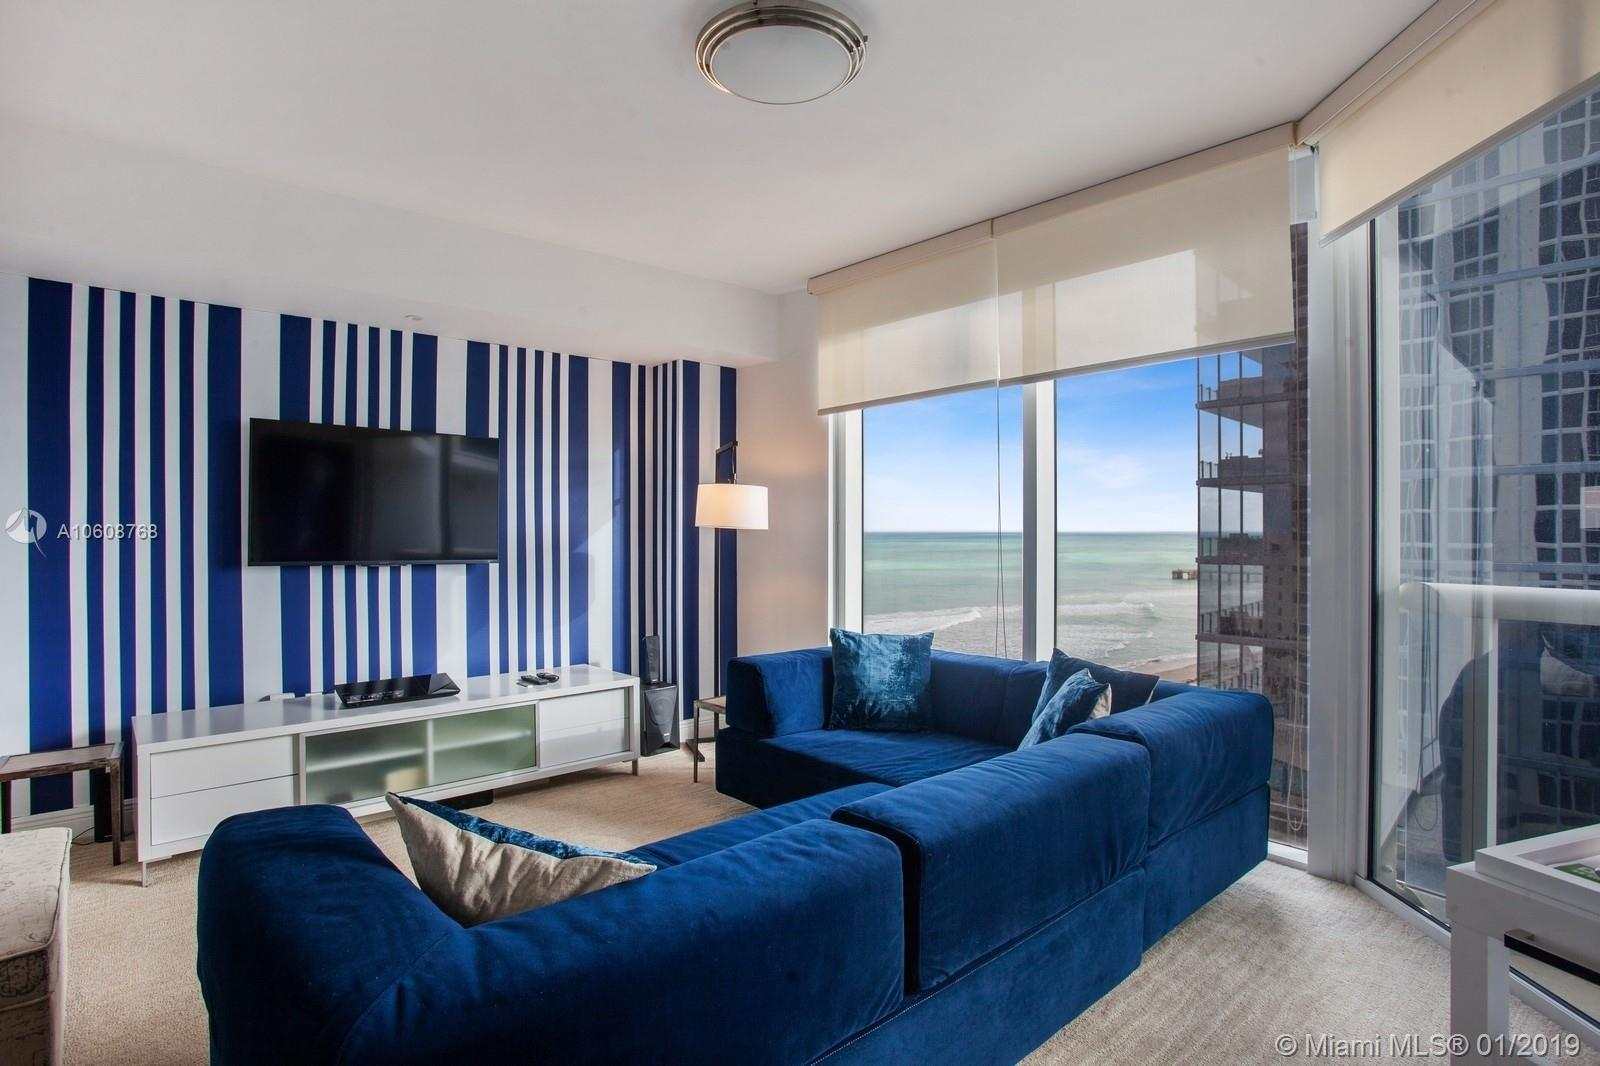 Direct ocean view. 2 beds 2 baths + Den (closed den as a third bedroom), split floor plan. 1644 SqFt